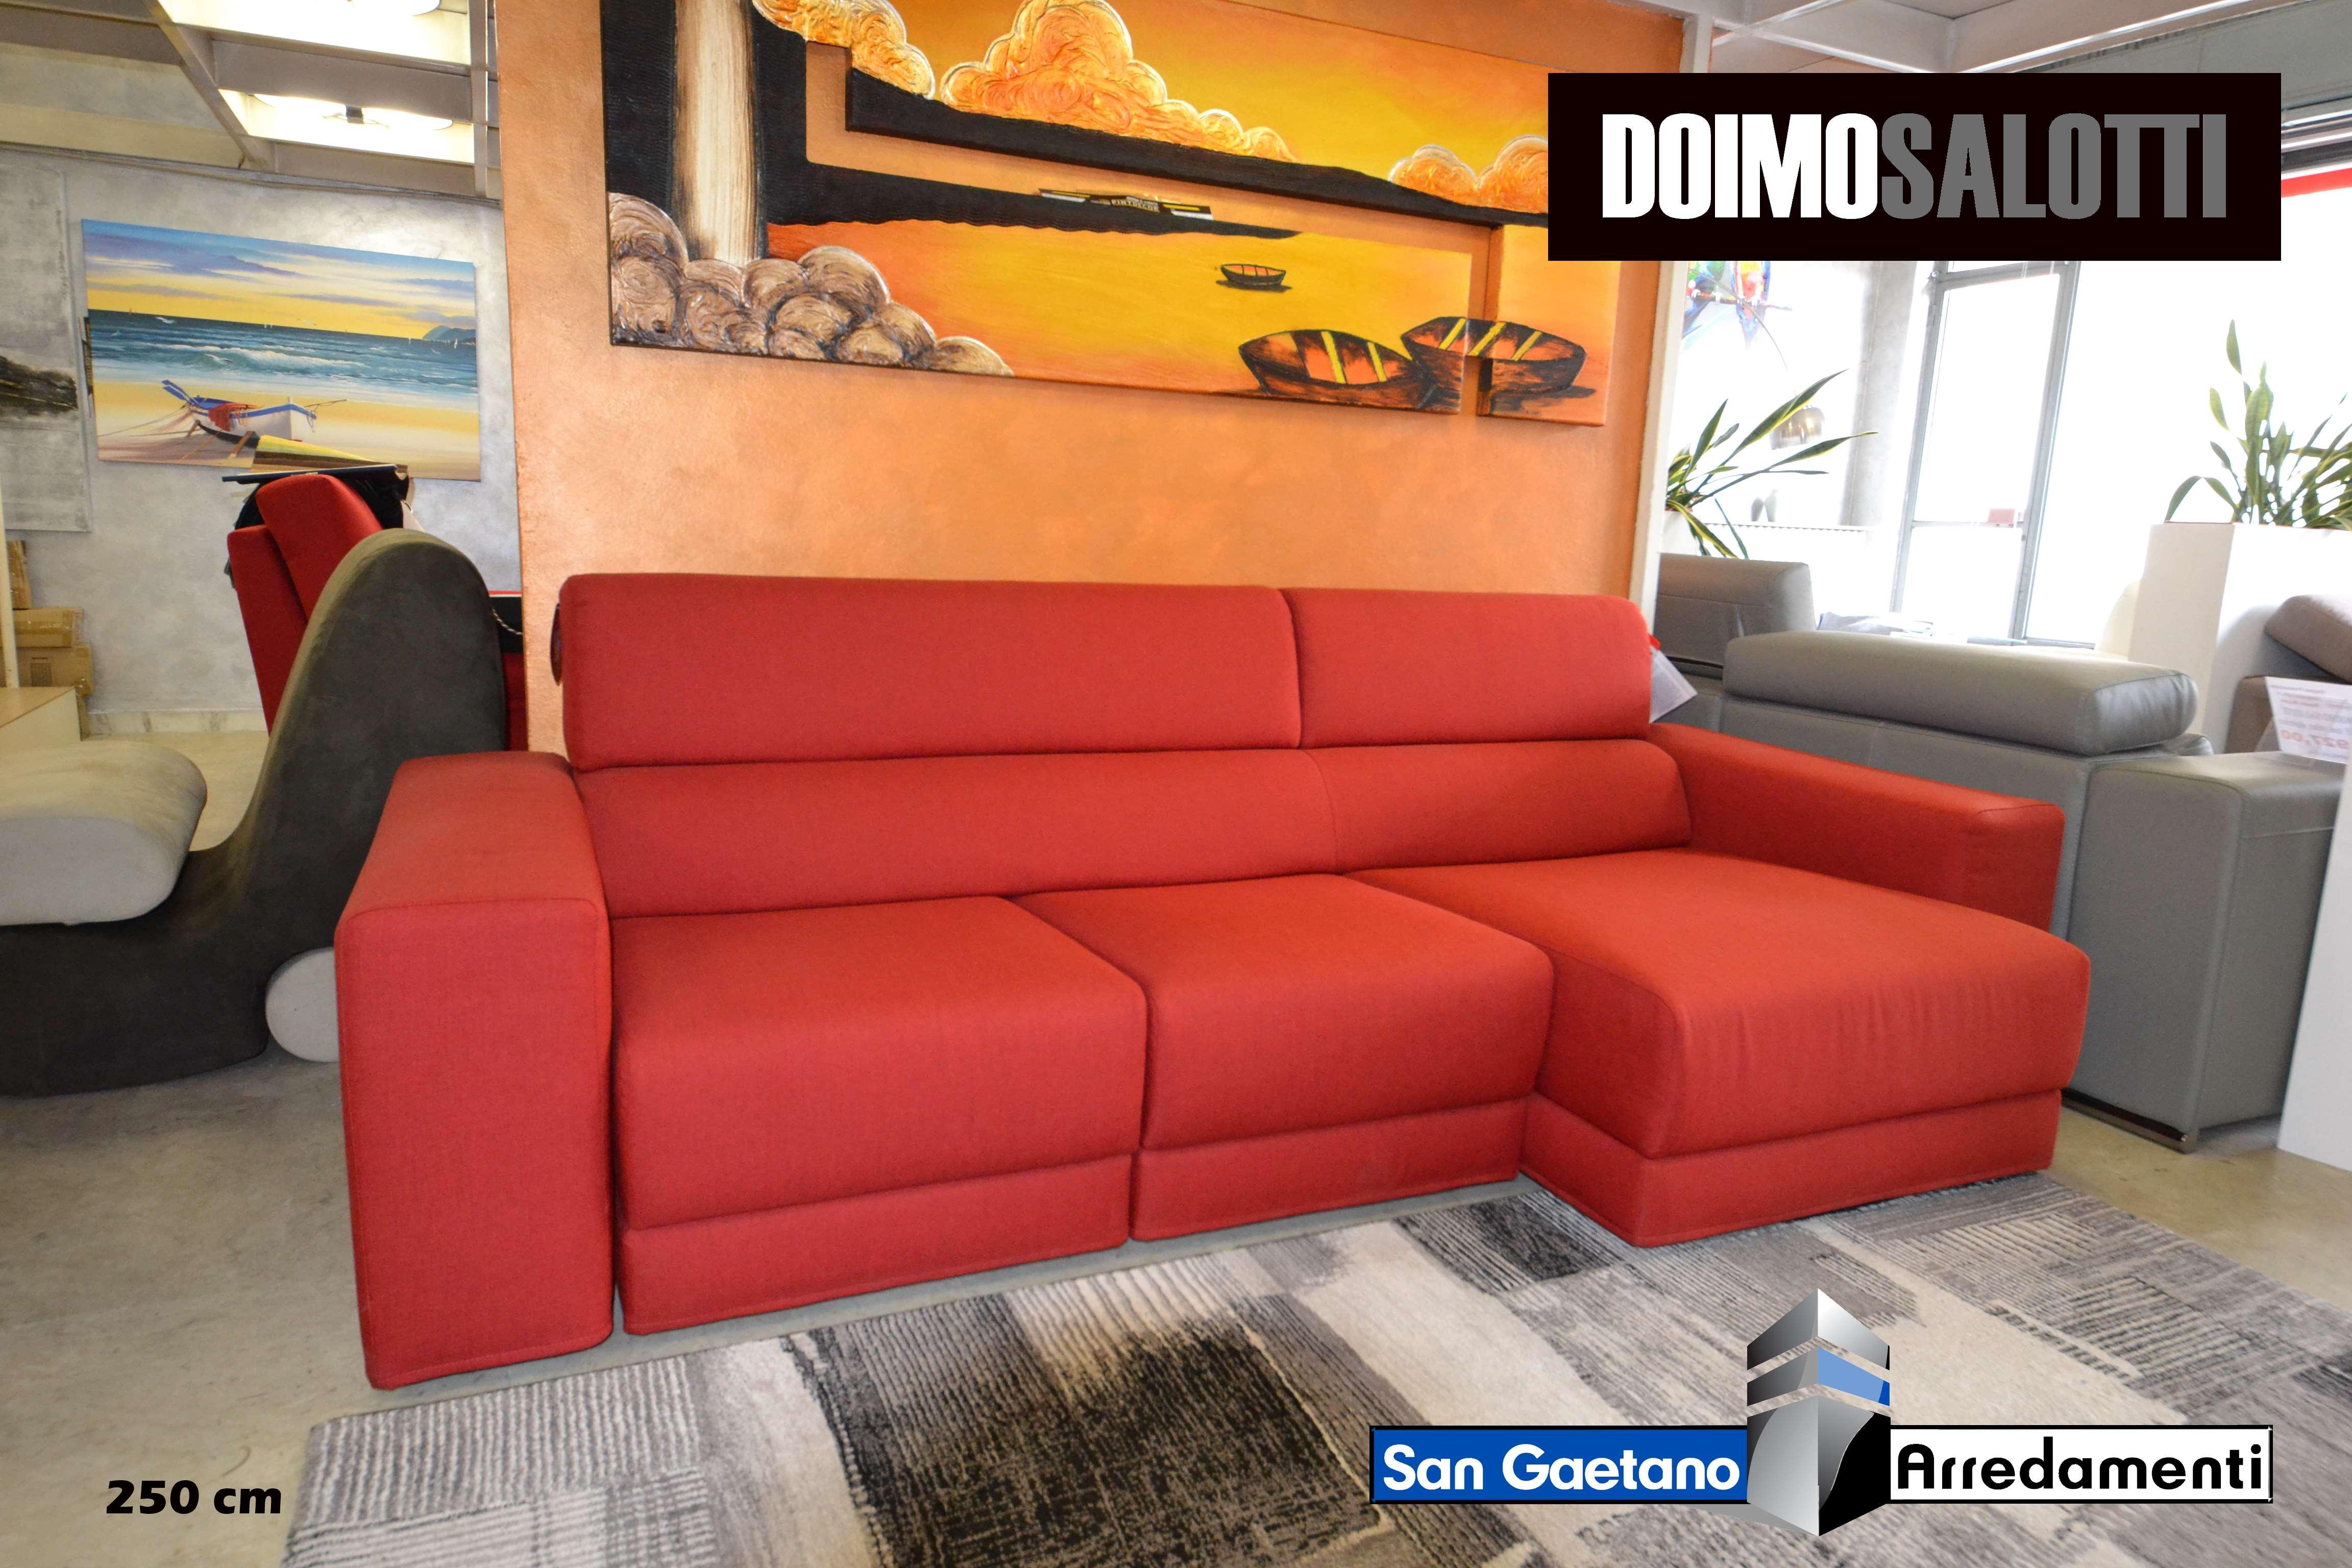 Offerta divano doimo salotti modello step san gaetano - Divano 250 cm ...